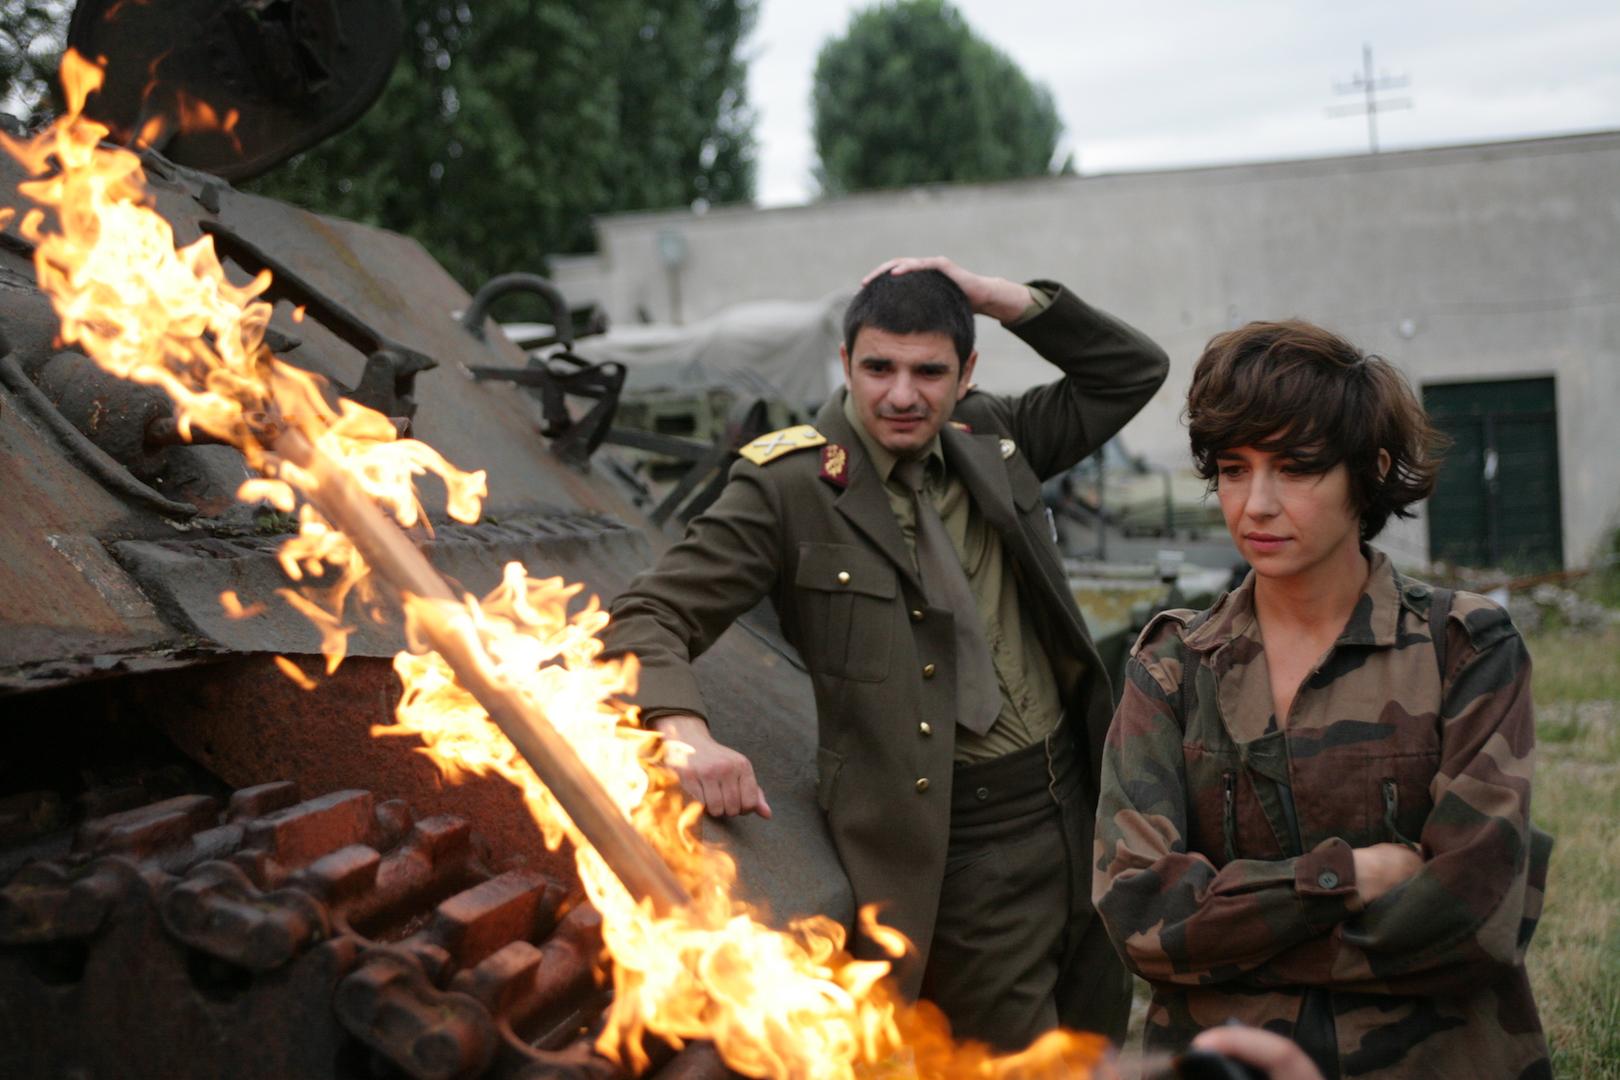 Ioana Iacob and Alex Bogdan in Îmi este indiferent daca în istorie vom intra ca barbari (2018)